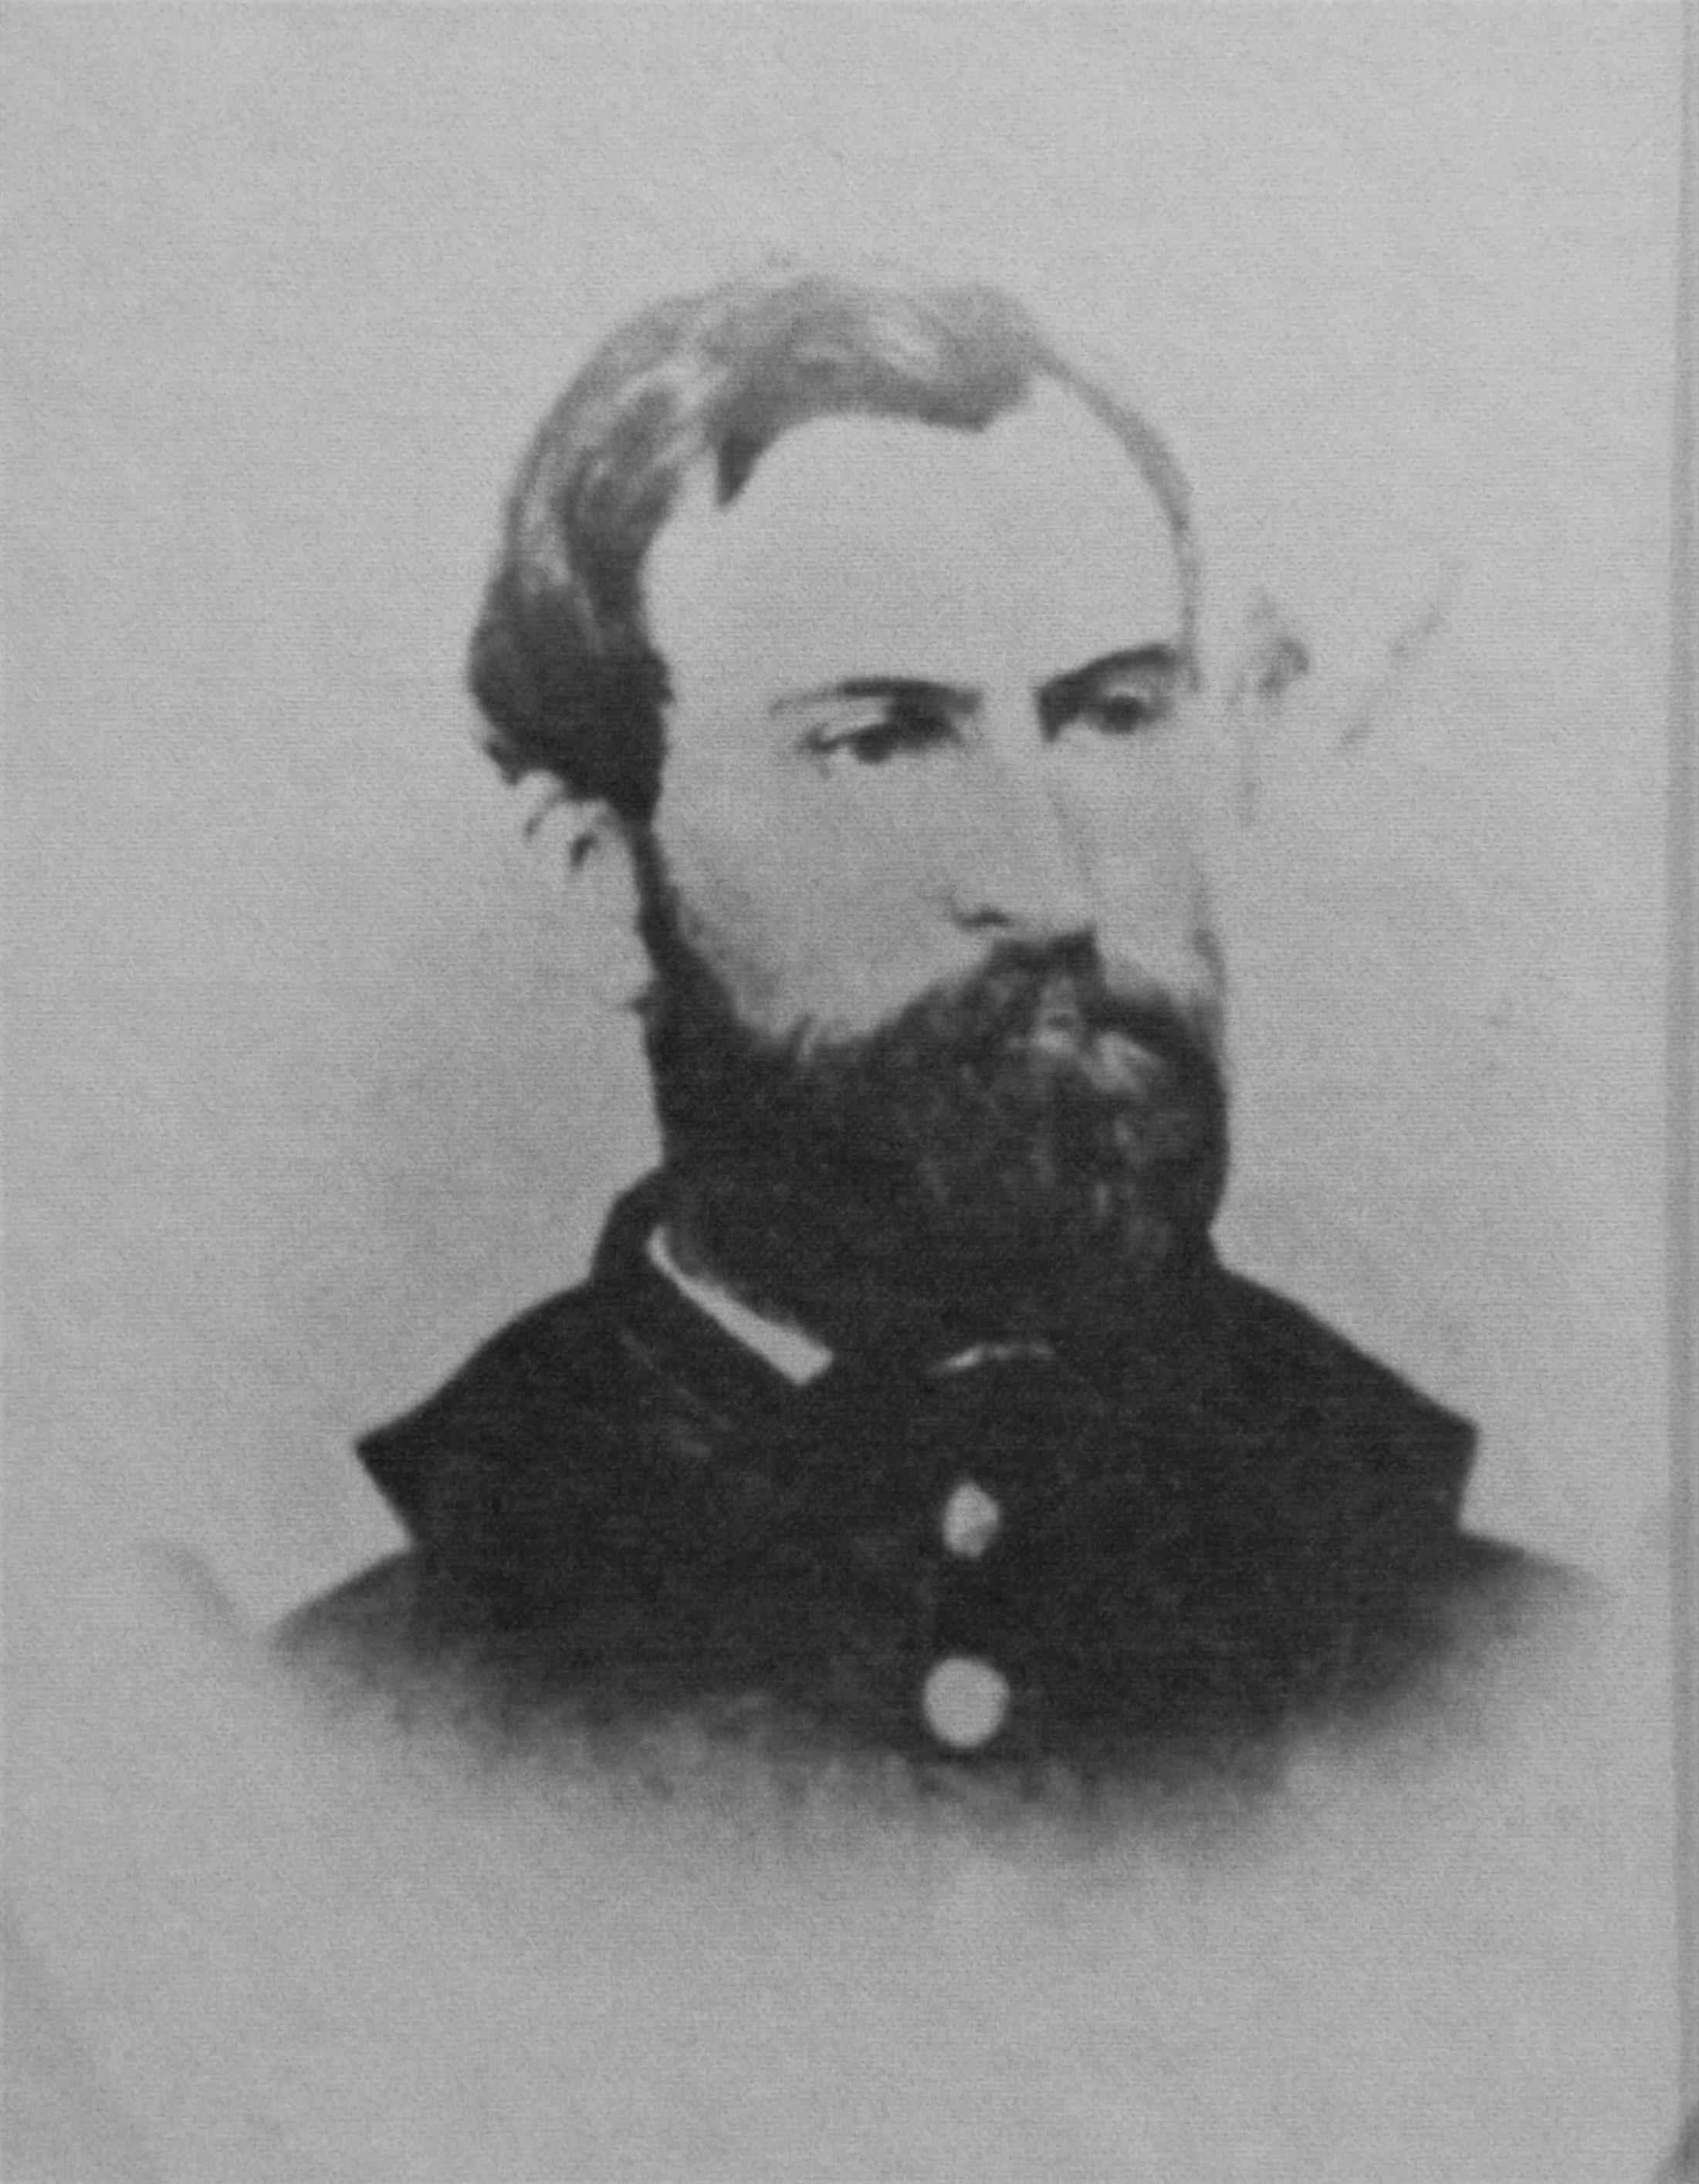 Elihu H. Mason Union Army Medal of Honor recipient